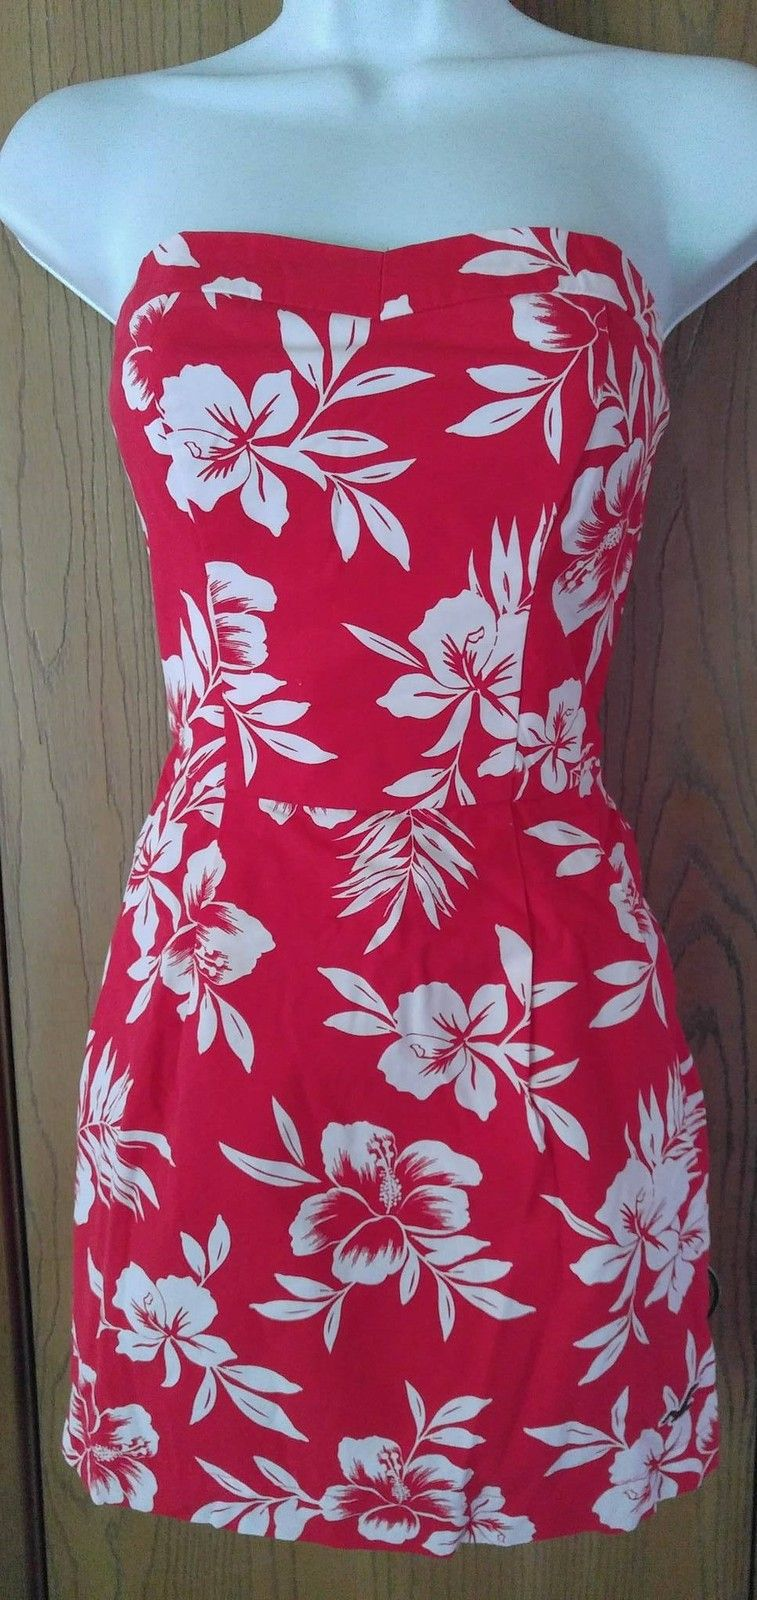 369df0329e72 NWT Red White Strapless Floral Flower Hollister Summer Dress Sundress Size  S by Juwannashop